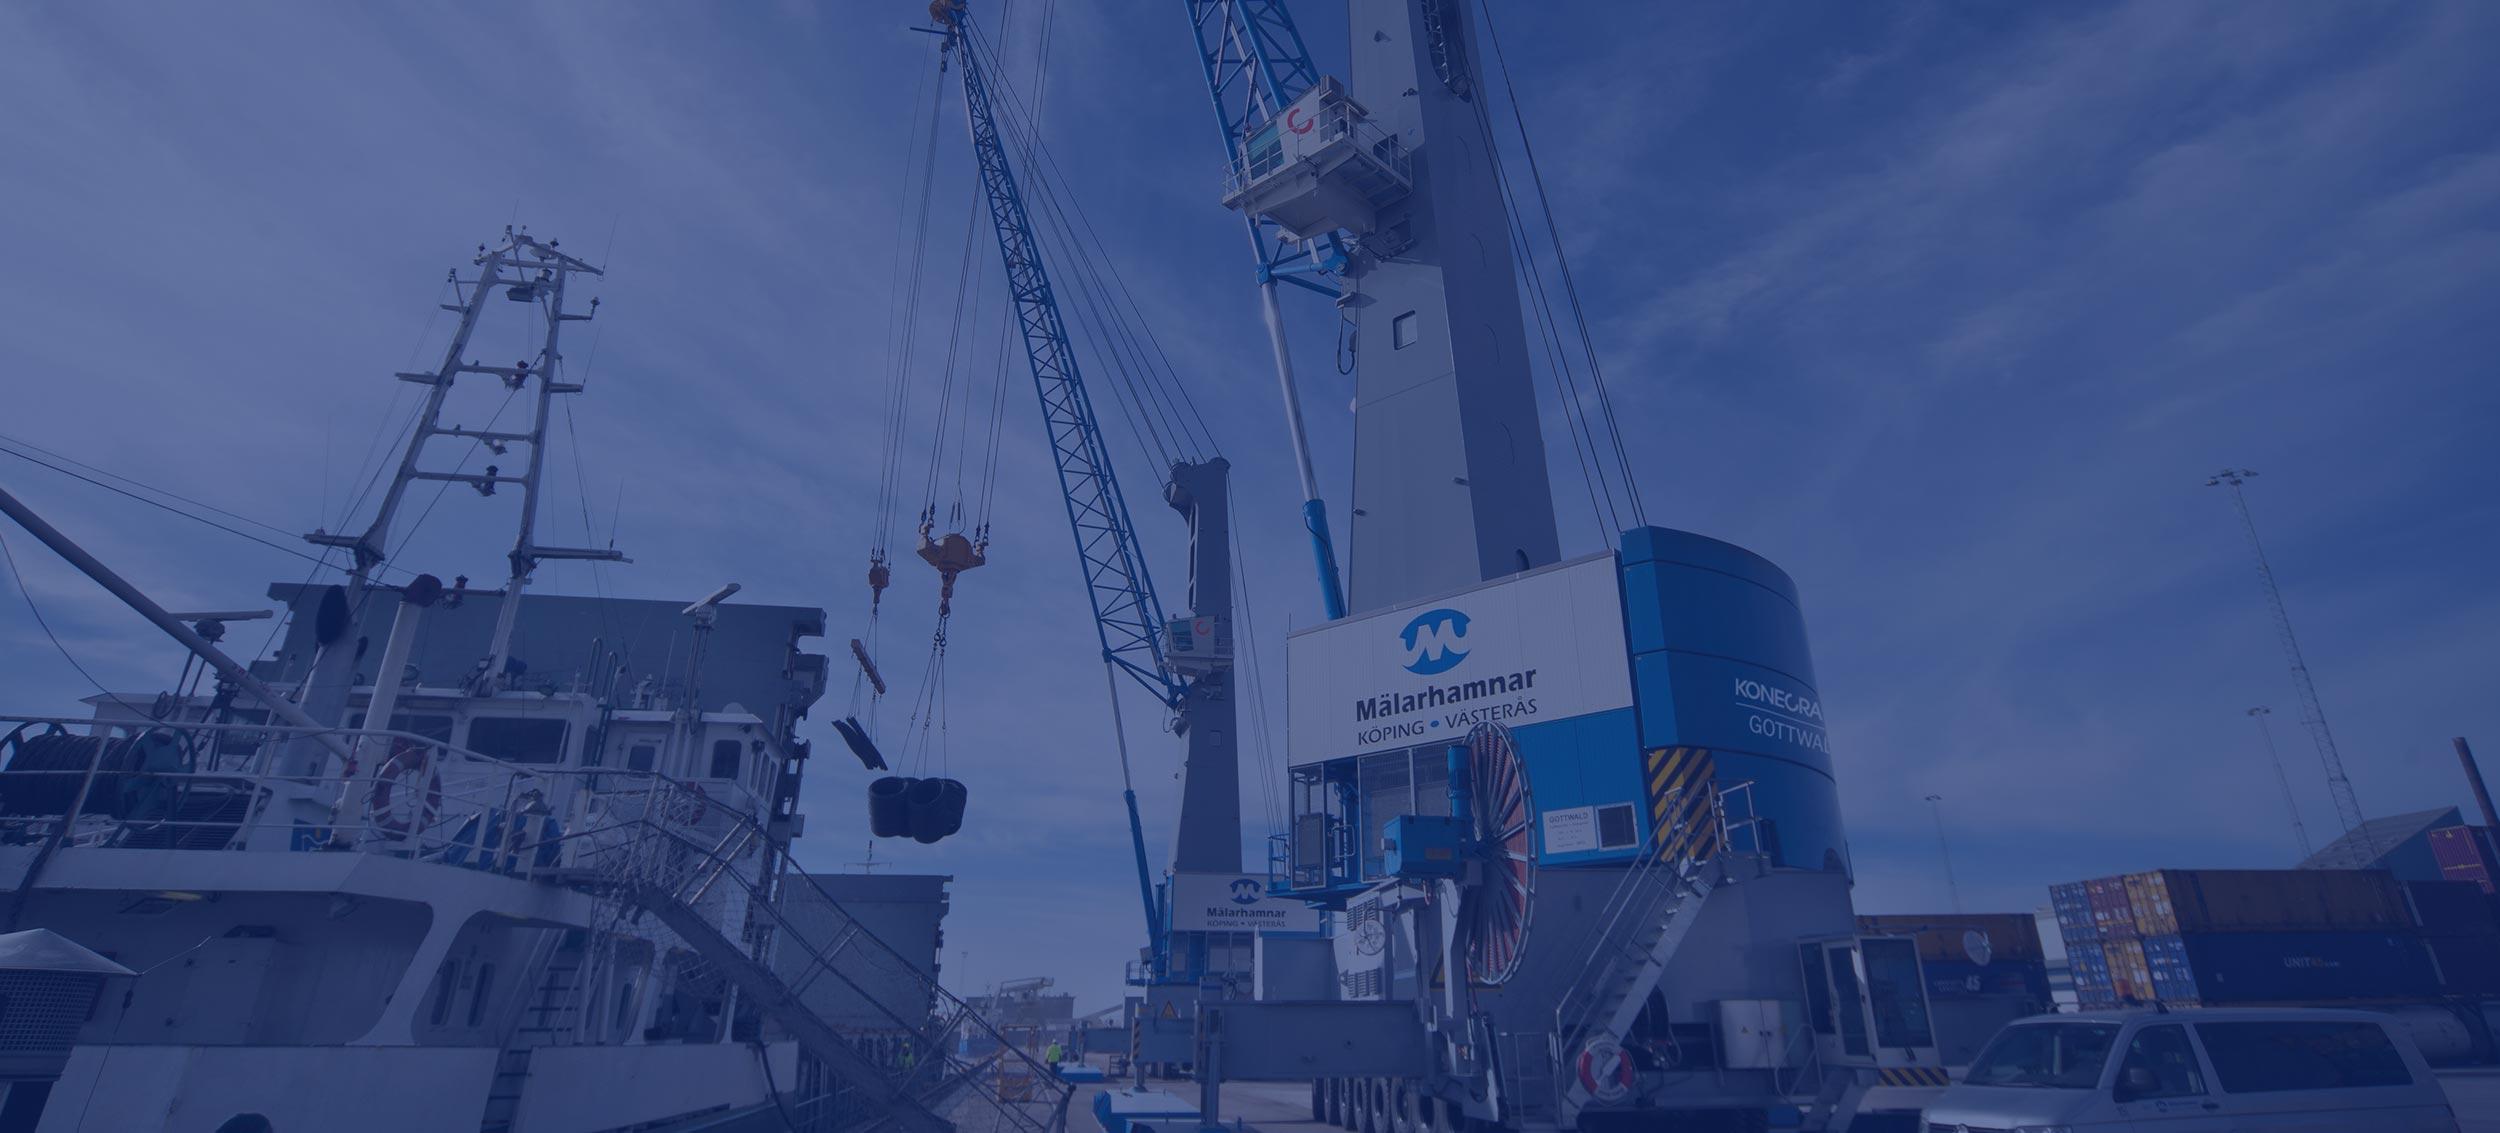 Konecranes Gottwald MHC mobile harbor cranes